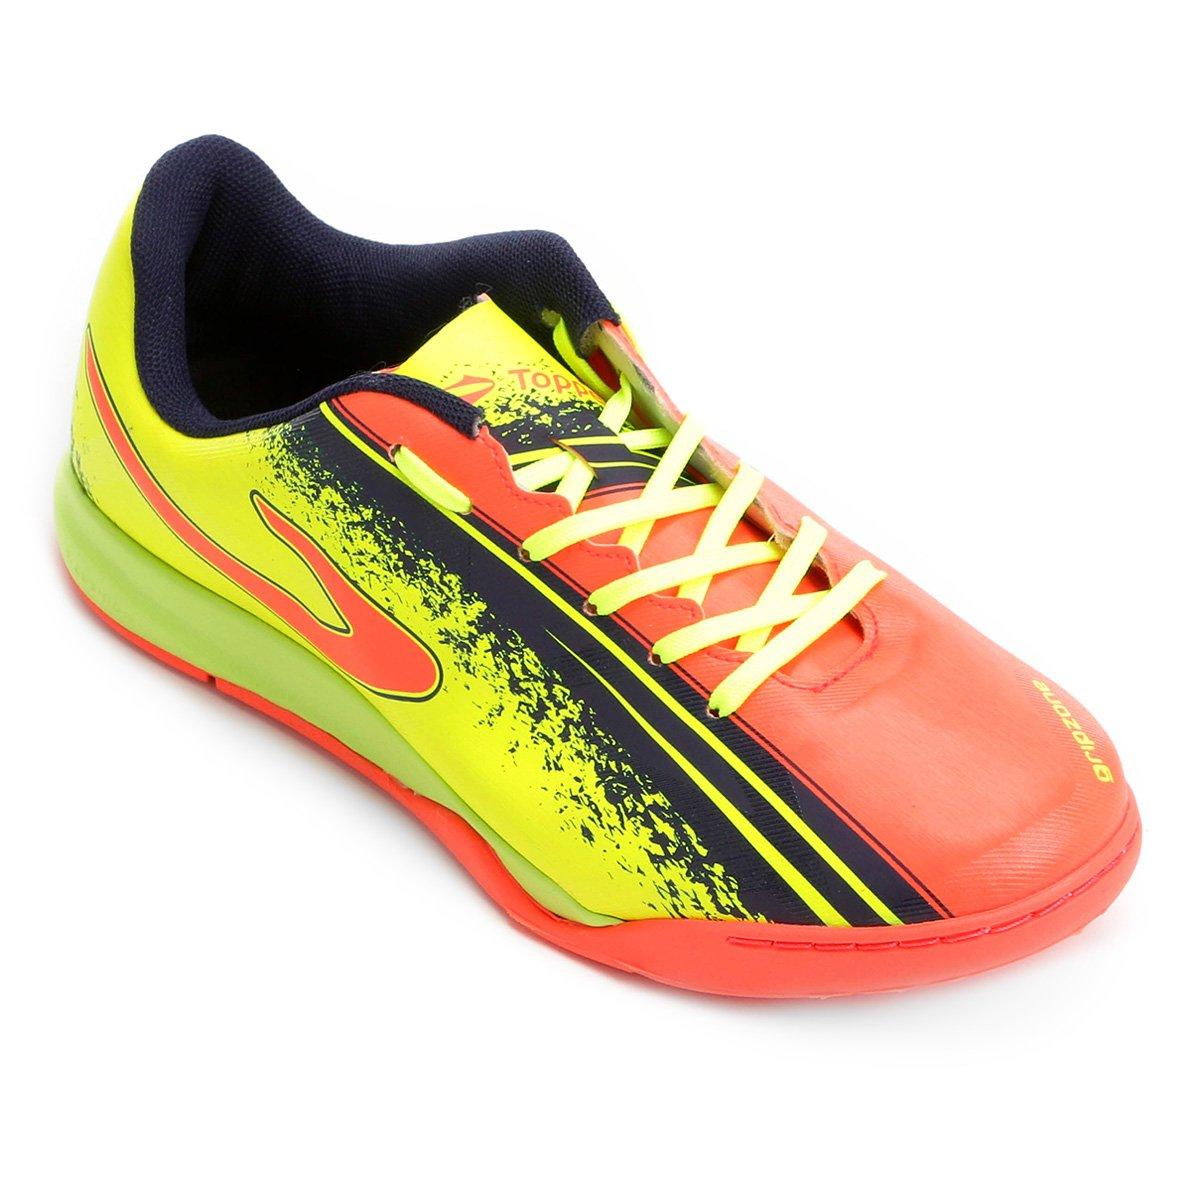 Chuteira Futsal Topper Trivela - Preto - Compre Agora  8148d69870757